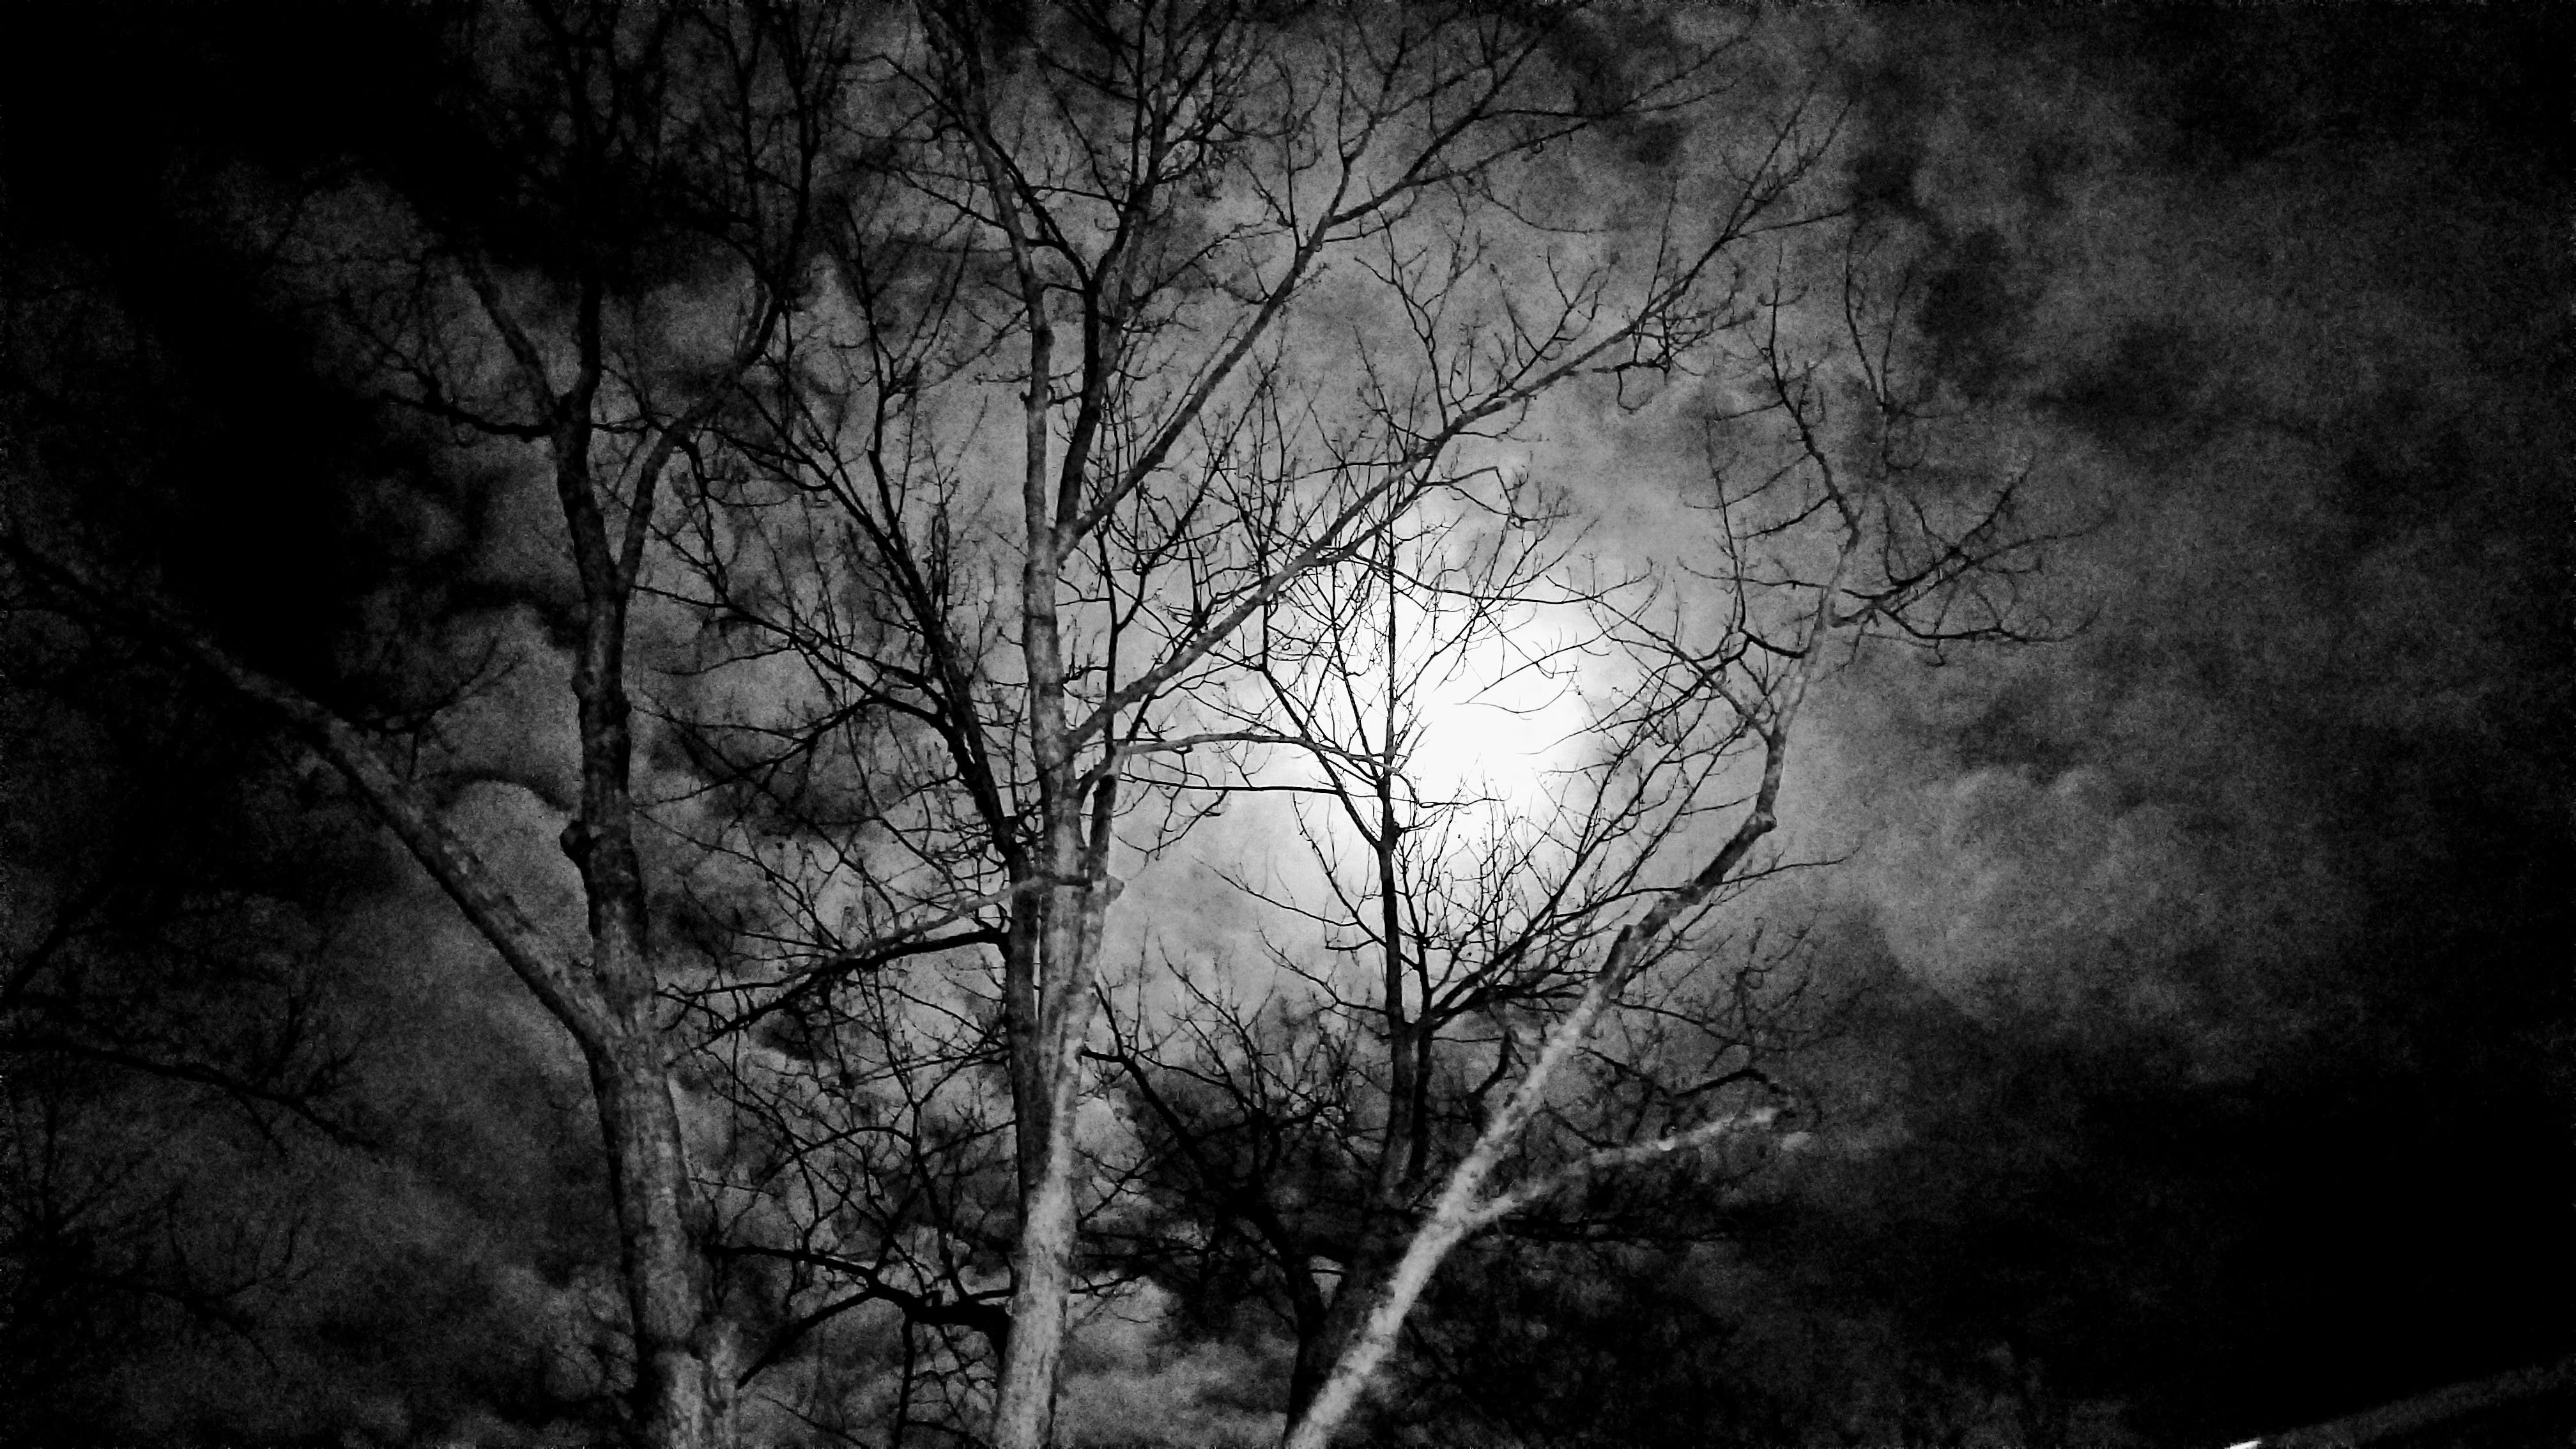 Free stock photo of dark night, spooky